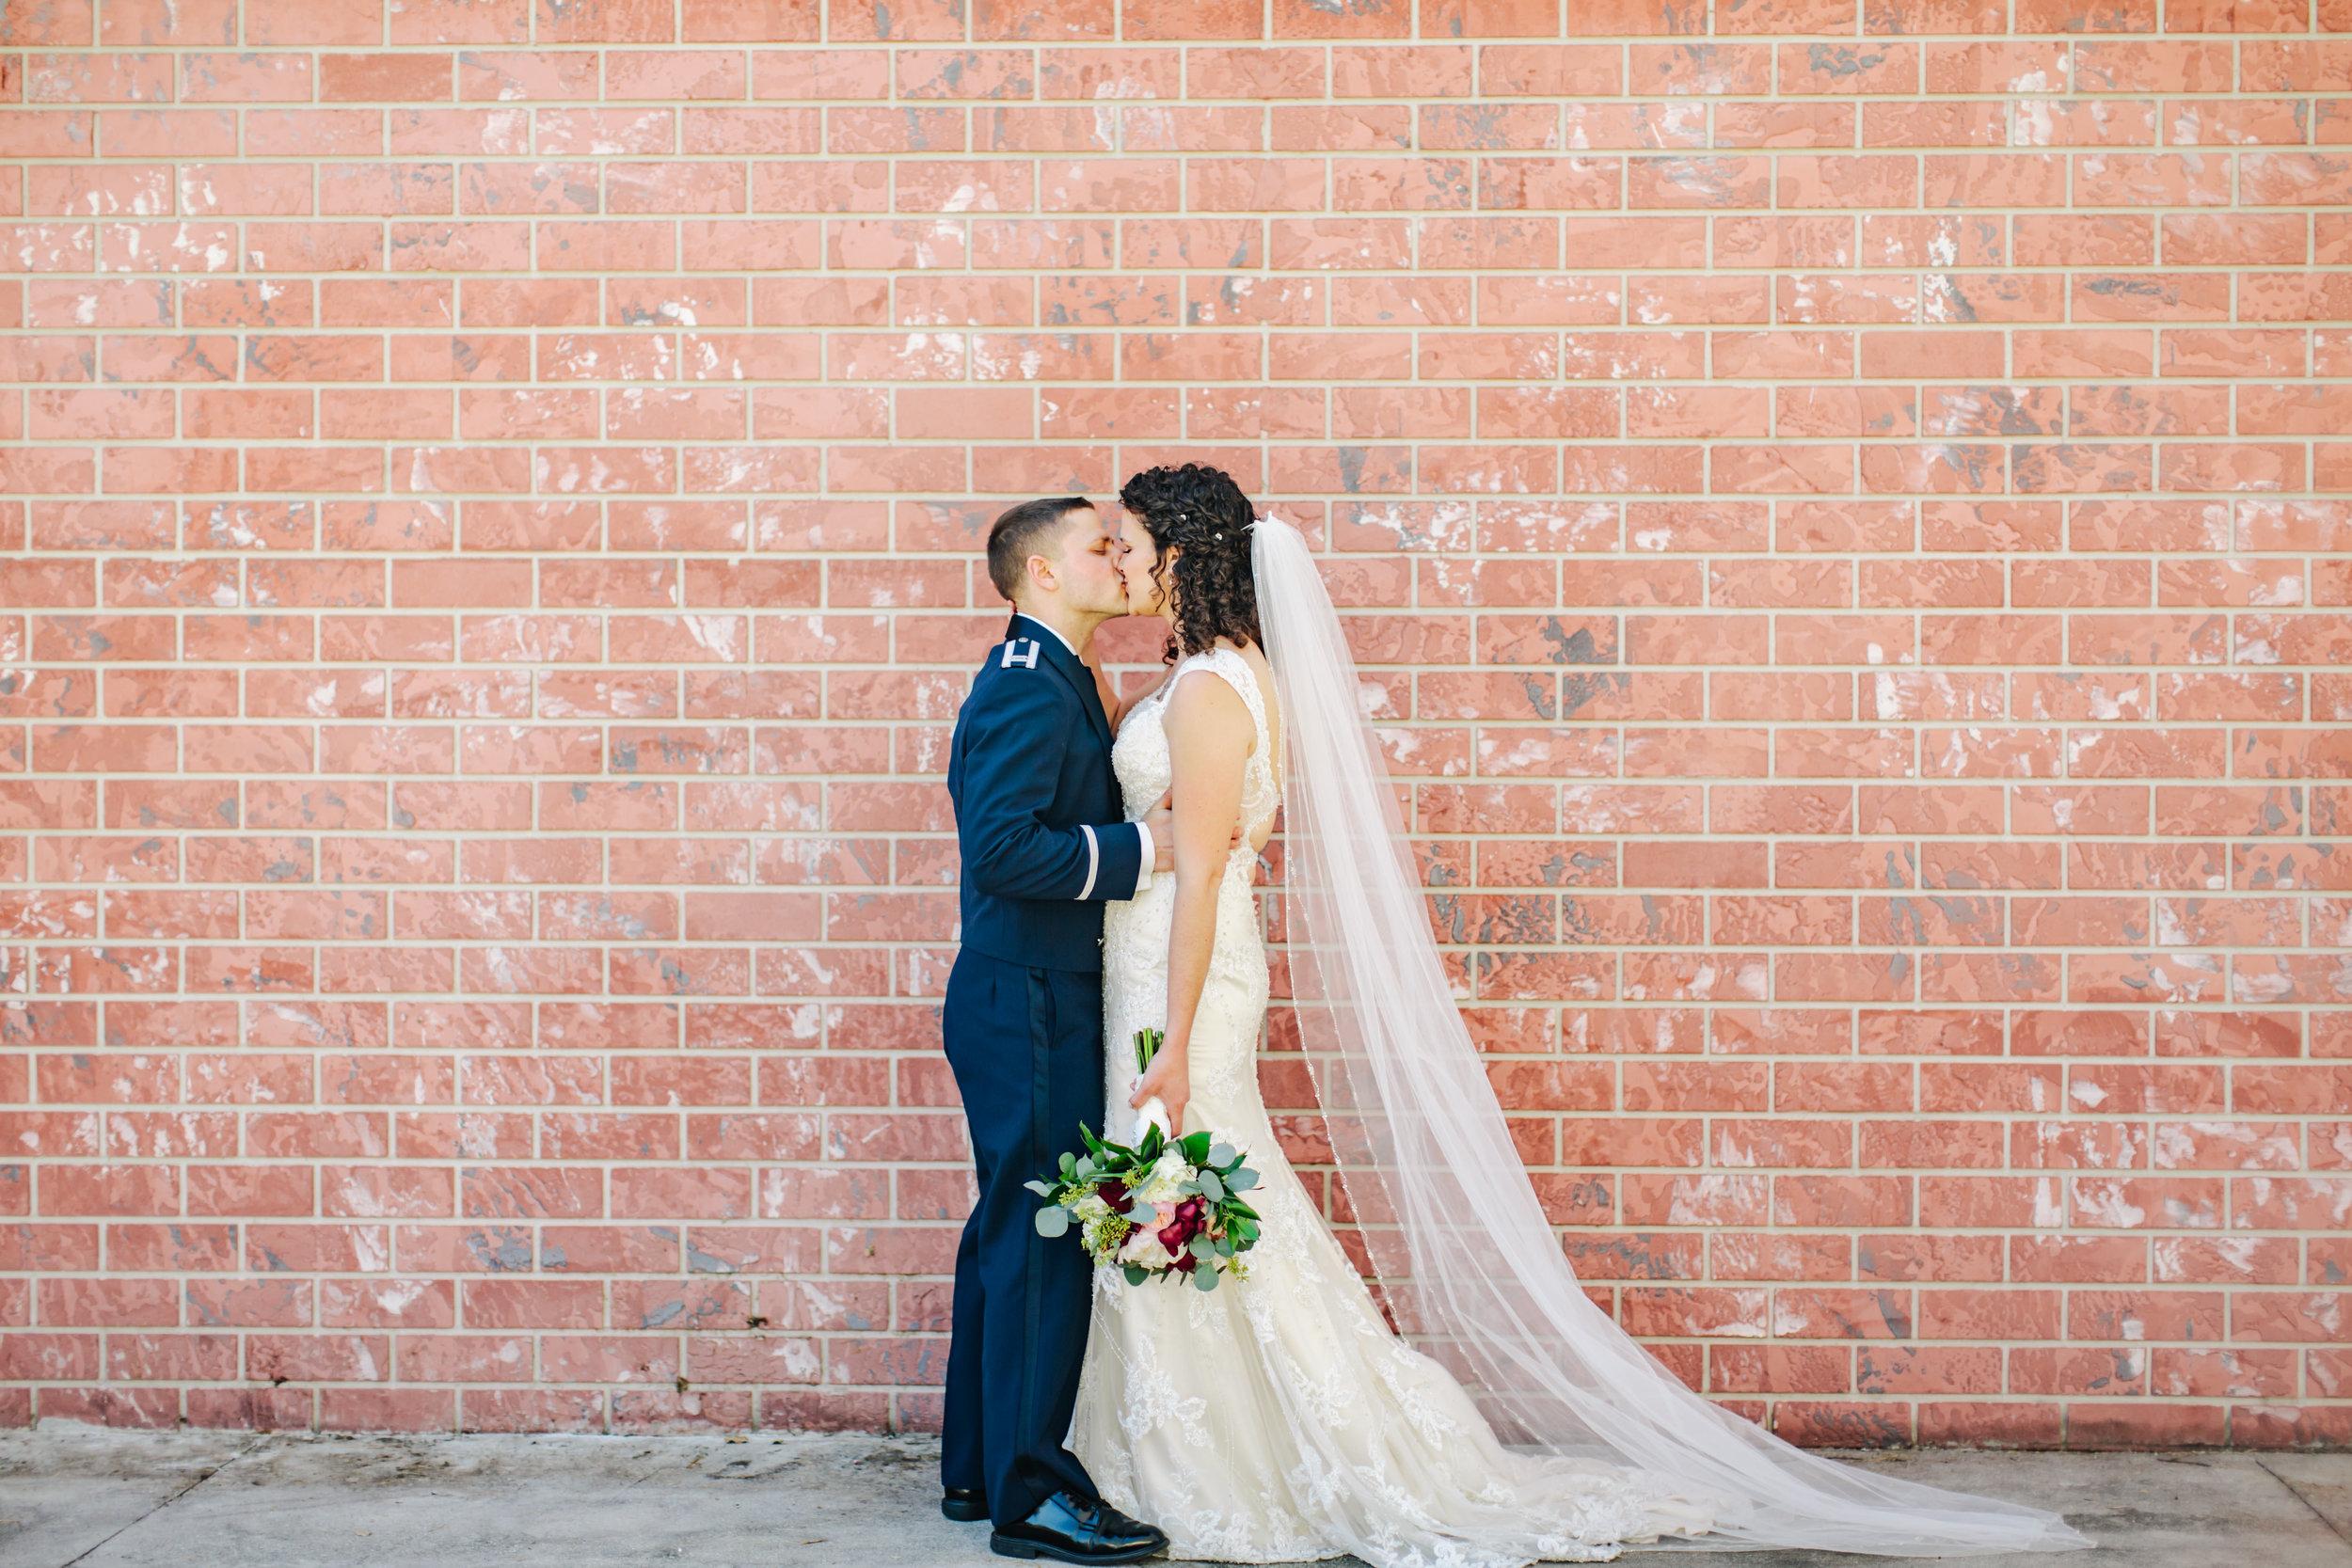 2018.03.17 Allison and Chuck Wedding Waelti Melbourne (492 of 569).jpg